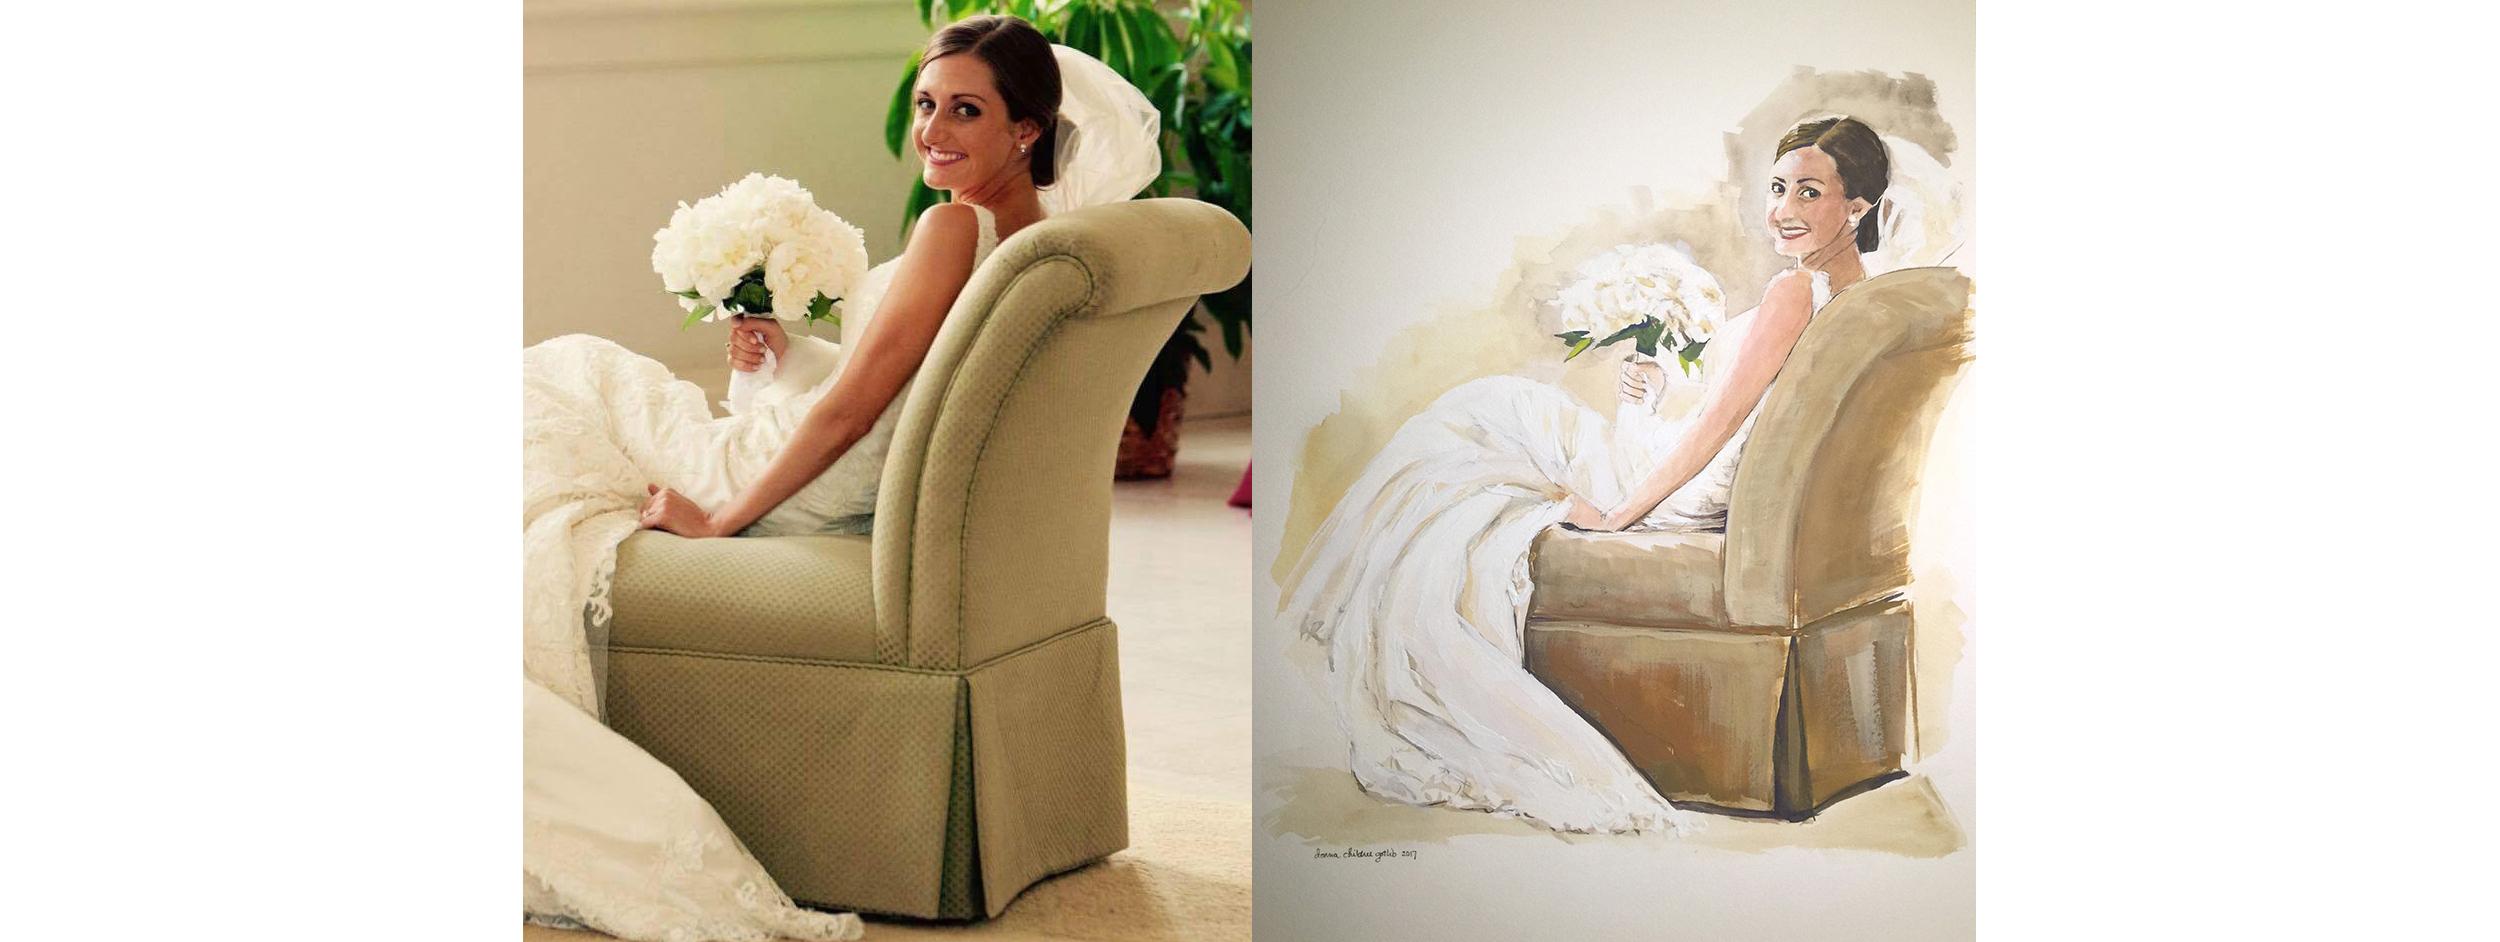 Southern Bride, original photo and portrait